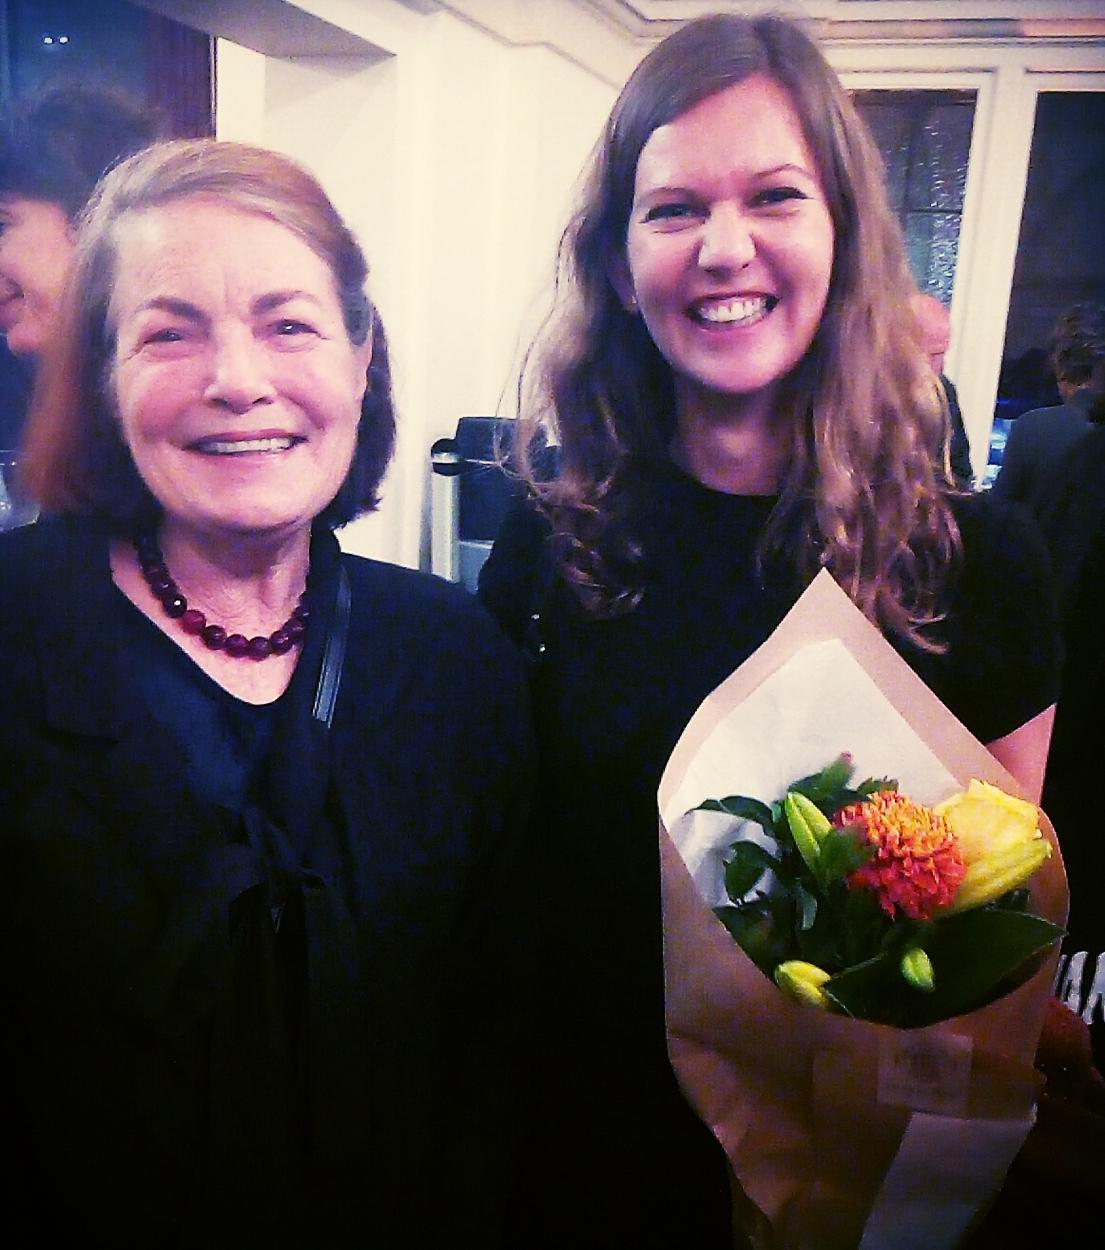 Linda & Gretchen Albrecht at the orchestra premiere